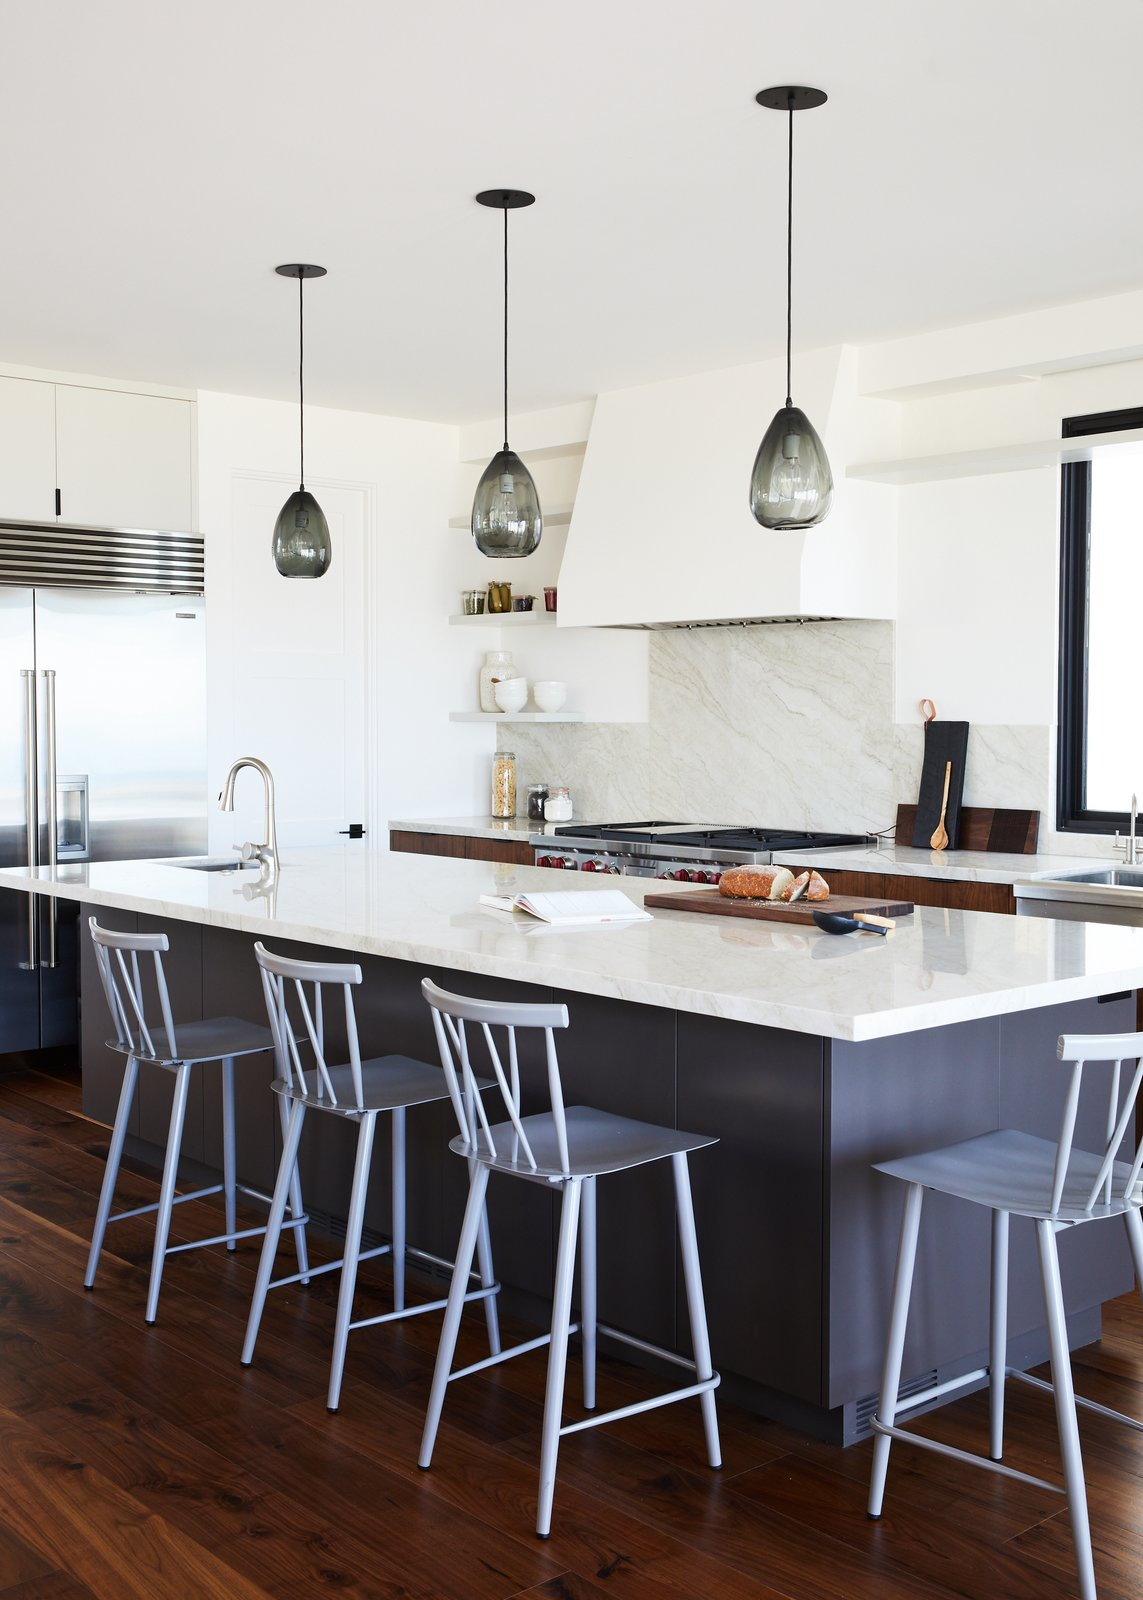 Kitchen, Dark Hardwood Floor, Pendant Lighting, Refrigerator, Medium Hardwood Floor, Marble Counter, Range Hood, Range, Open Cabinet, and Stone Slab Backsplashe Kitchen  The Strand Residence